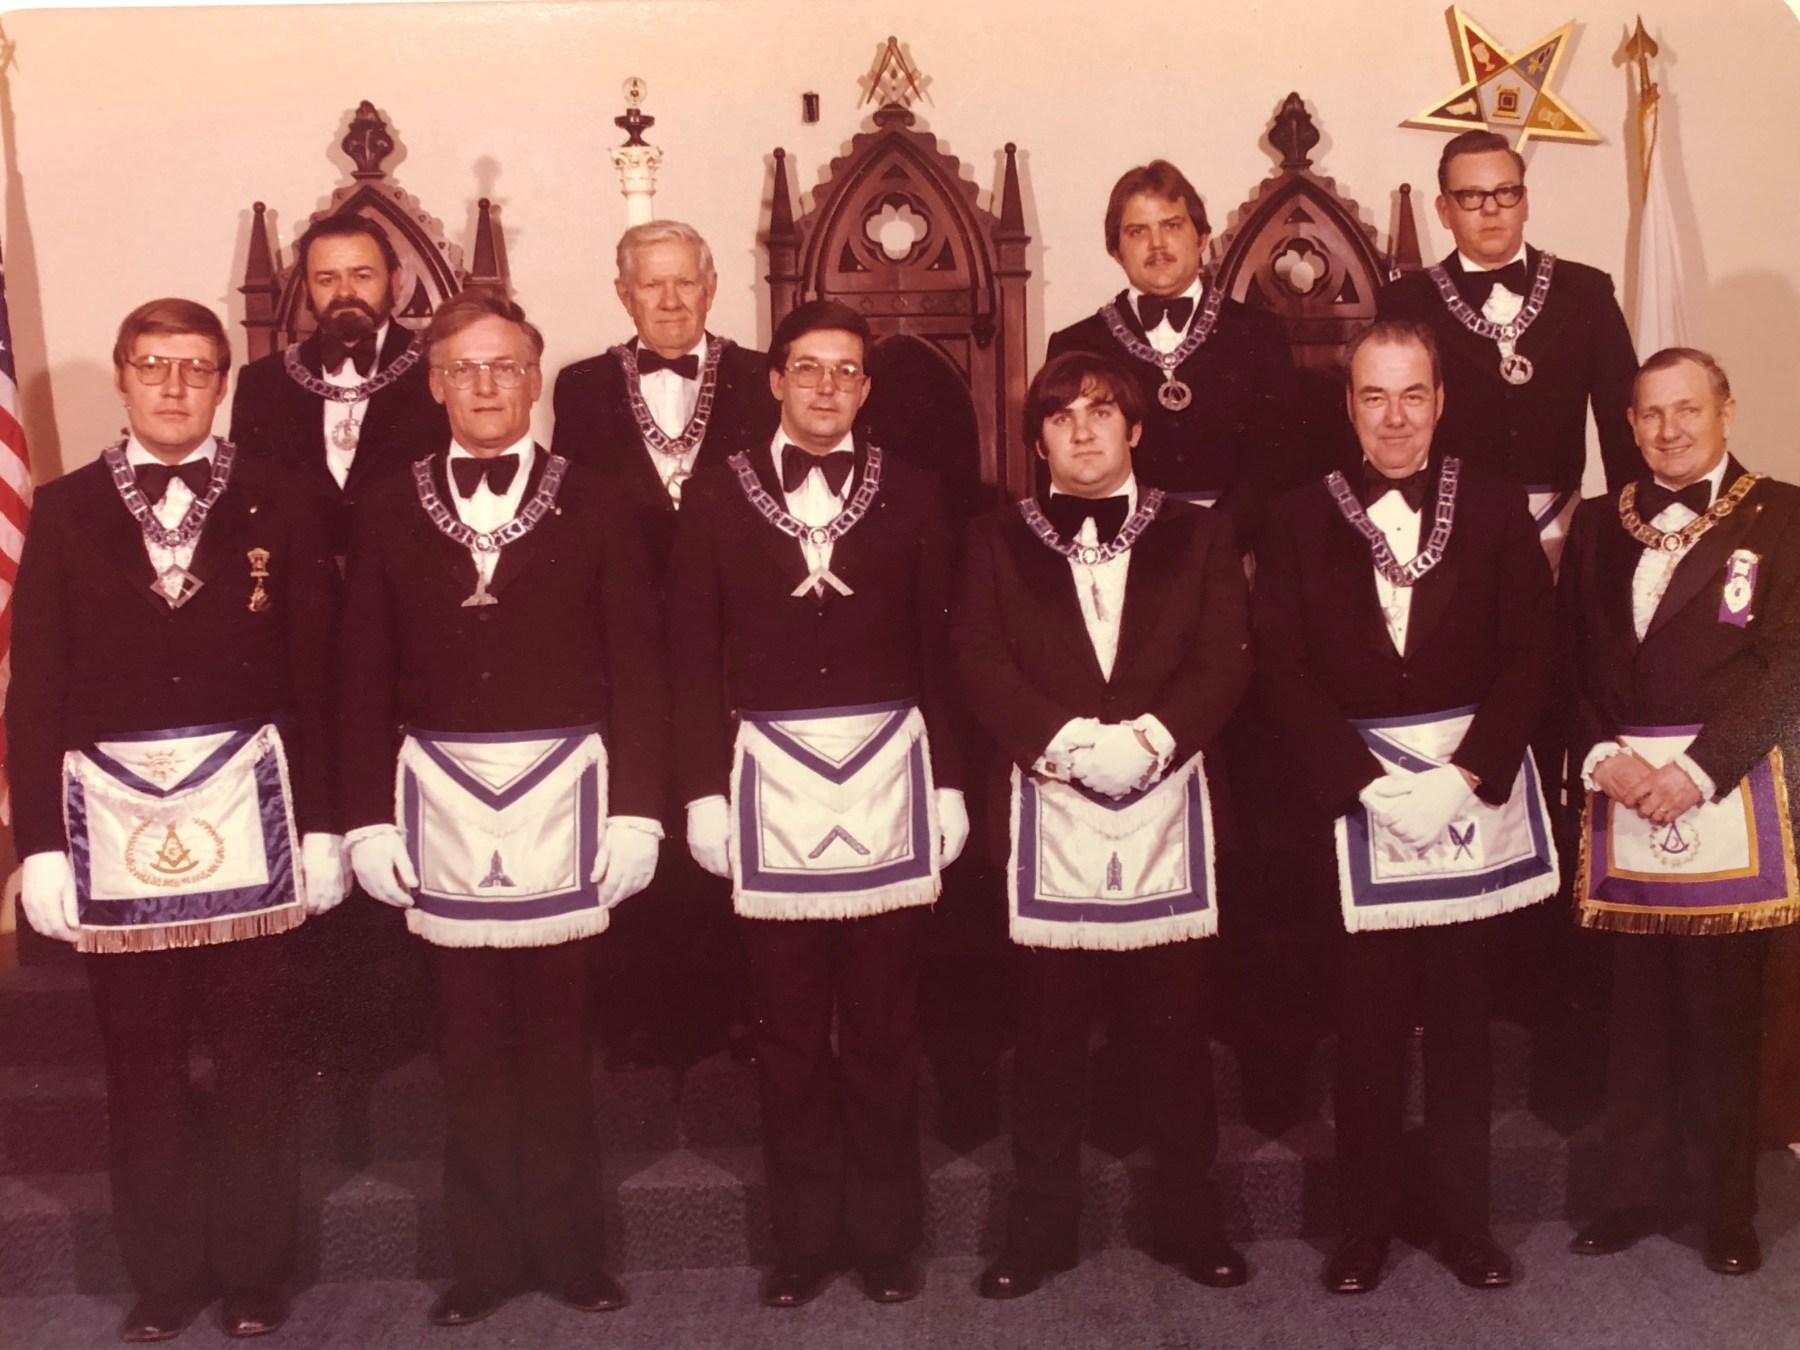 Simonds Lodge lineup, Burlington MA